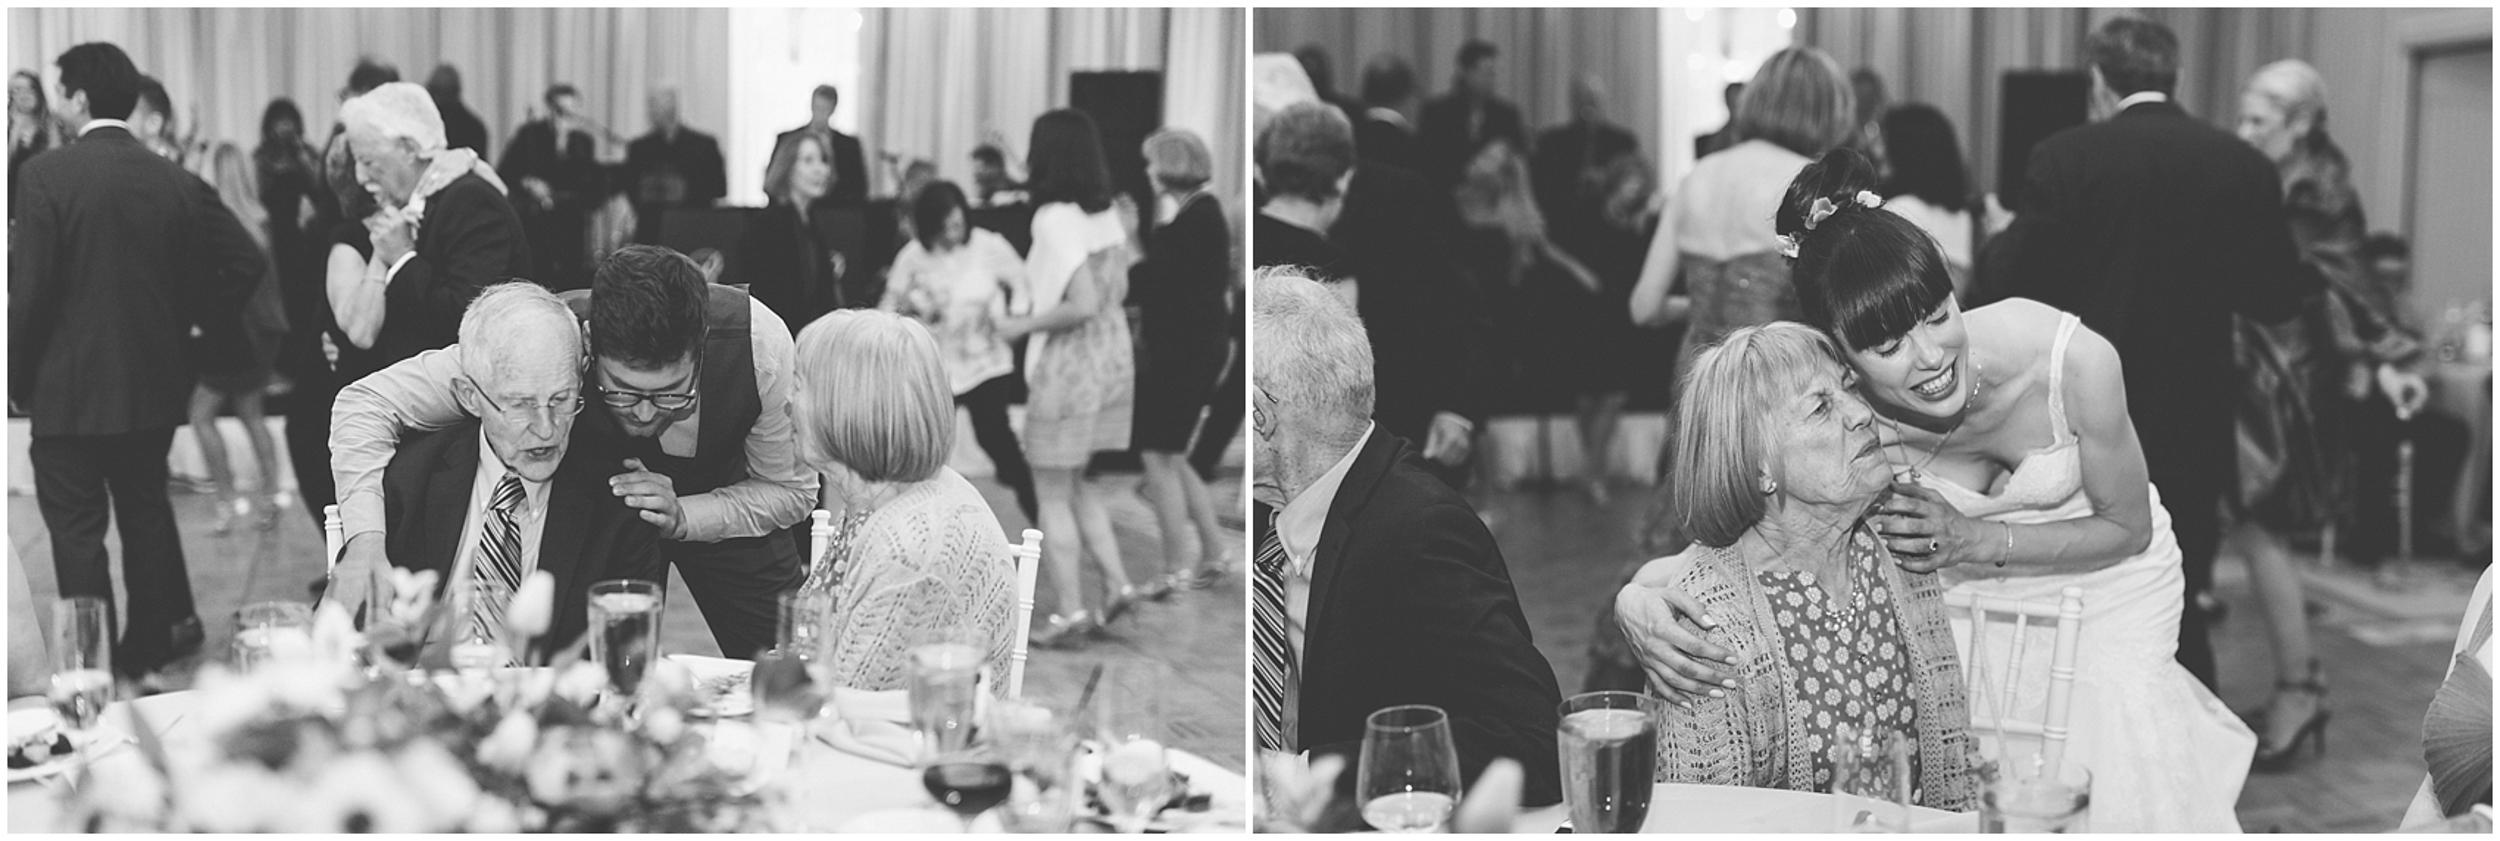 Casa Del Mar Wedding Photography Smetona Photo-0067.jpg